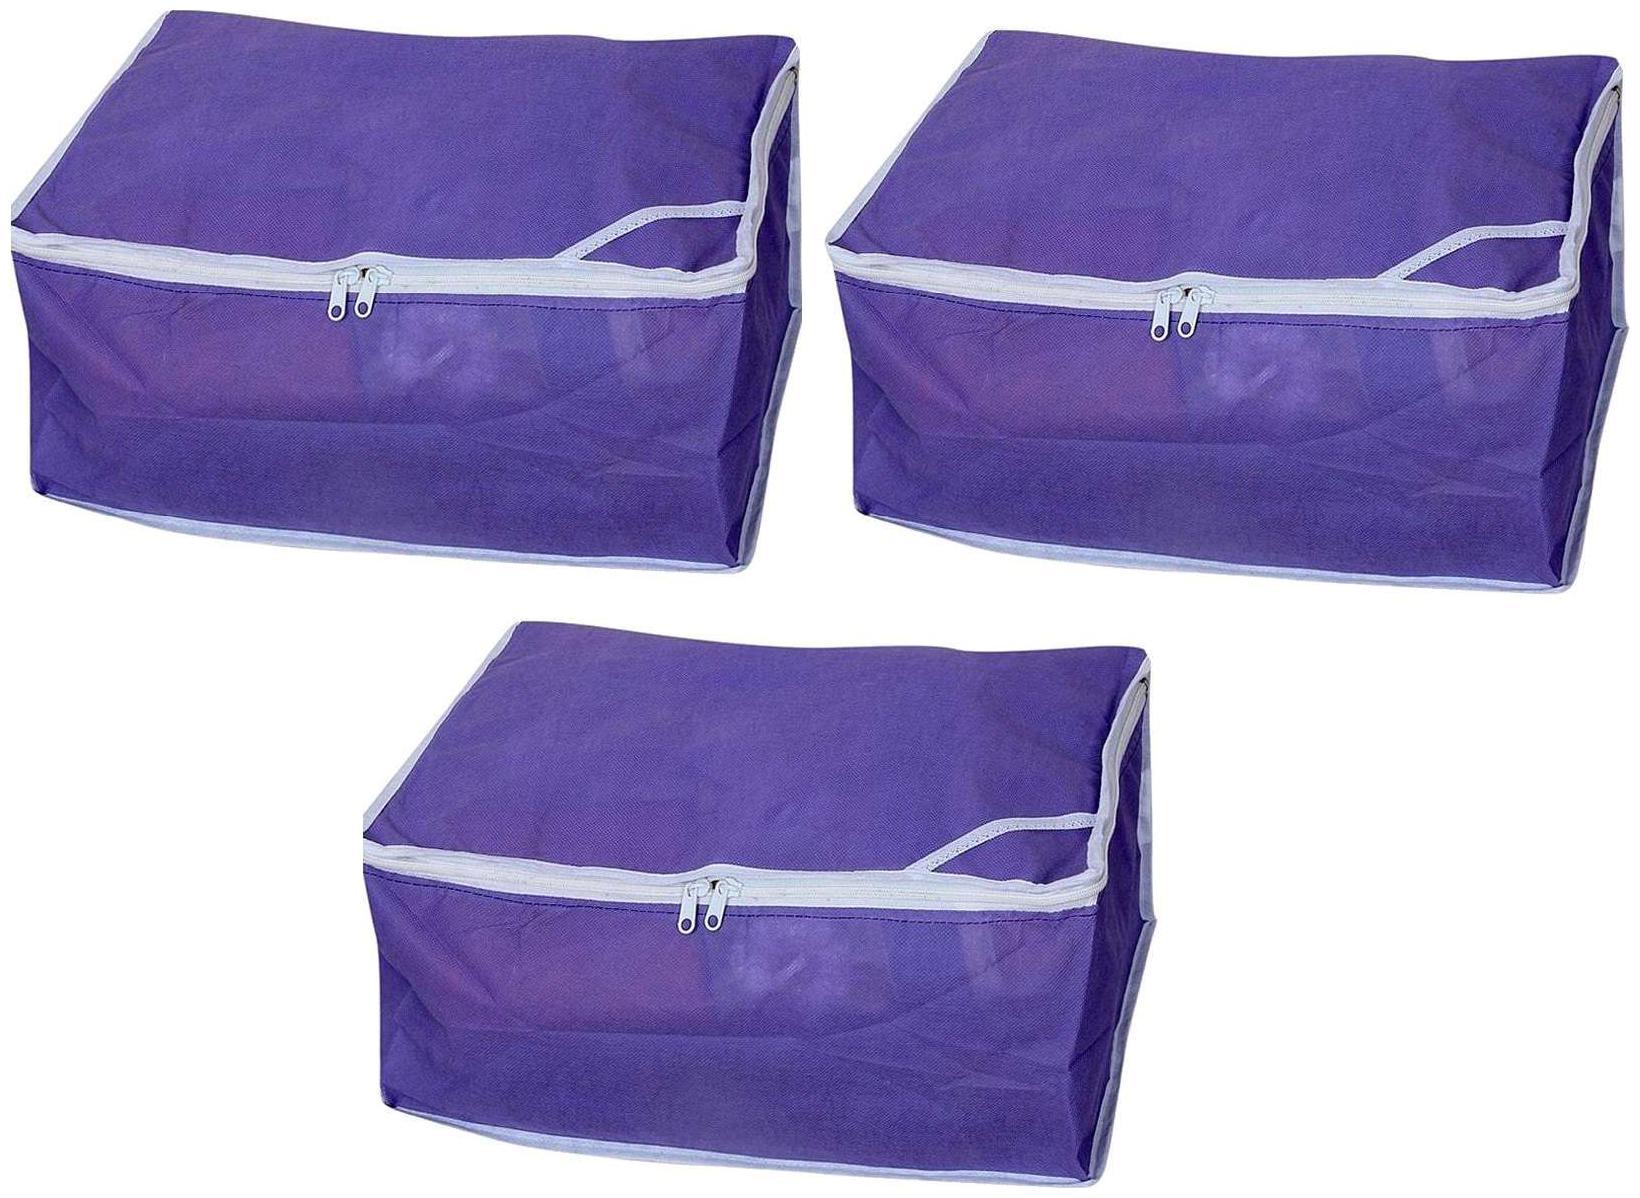 Fashion Bizz Non Woven Purple Saree covers Set of 3 pcs Combo/Wardrobe Organiser/Regular Clothes Bag